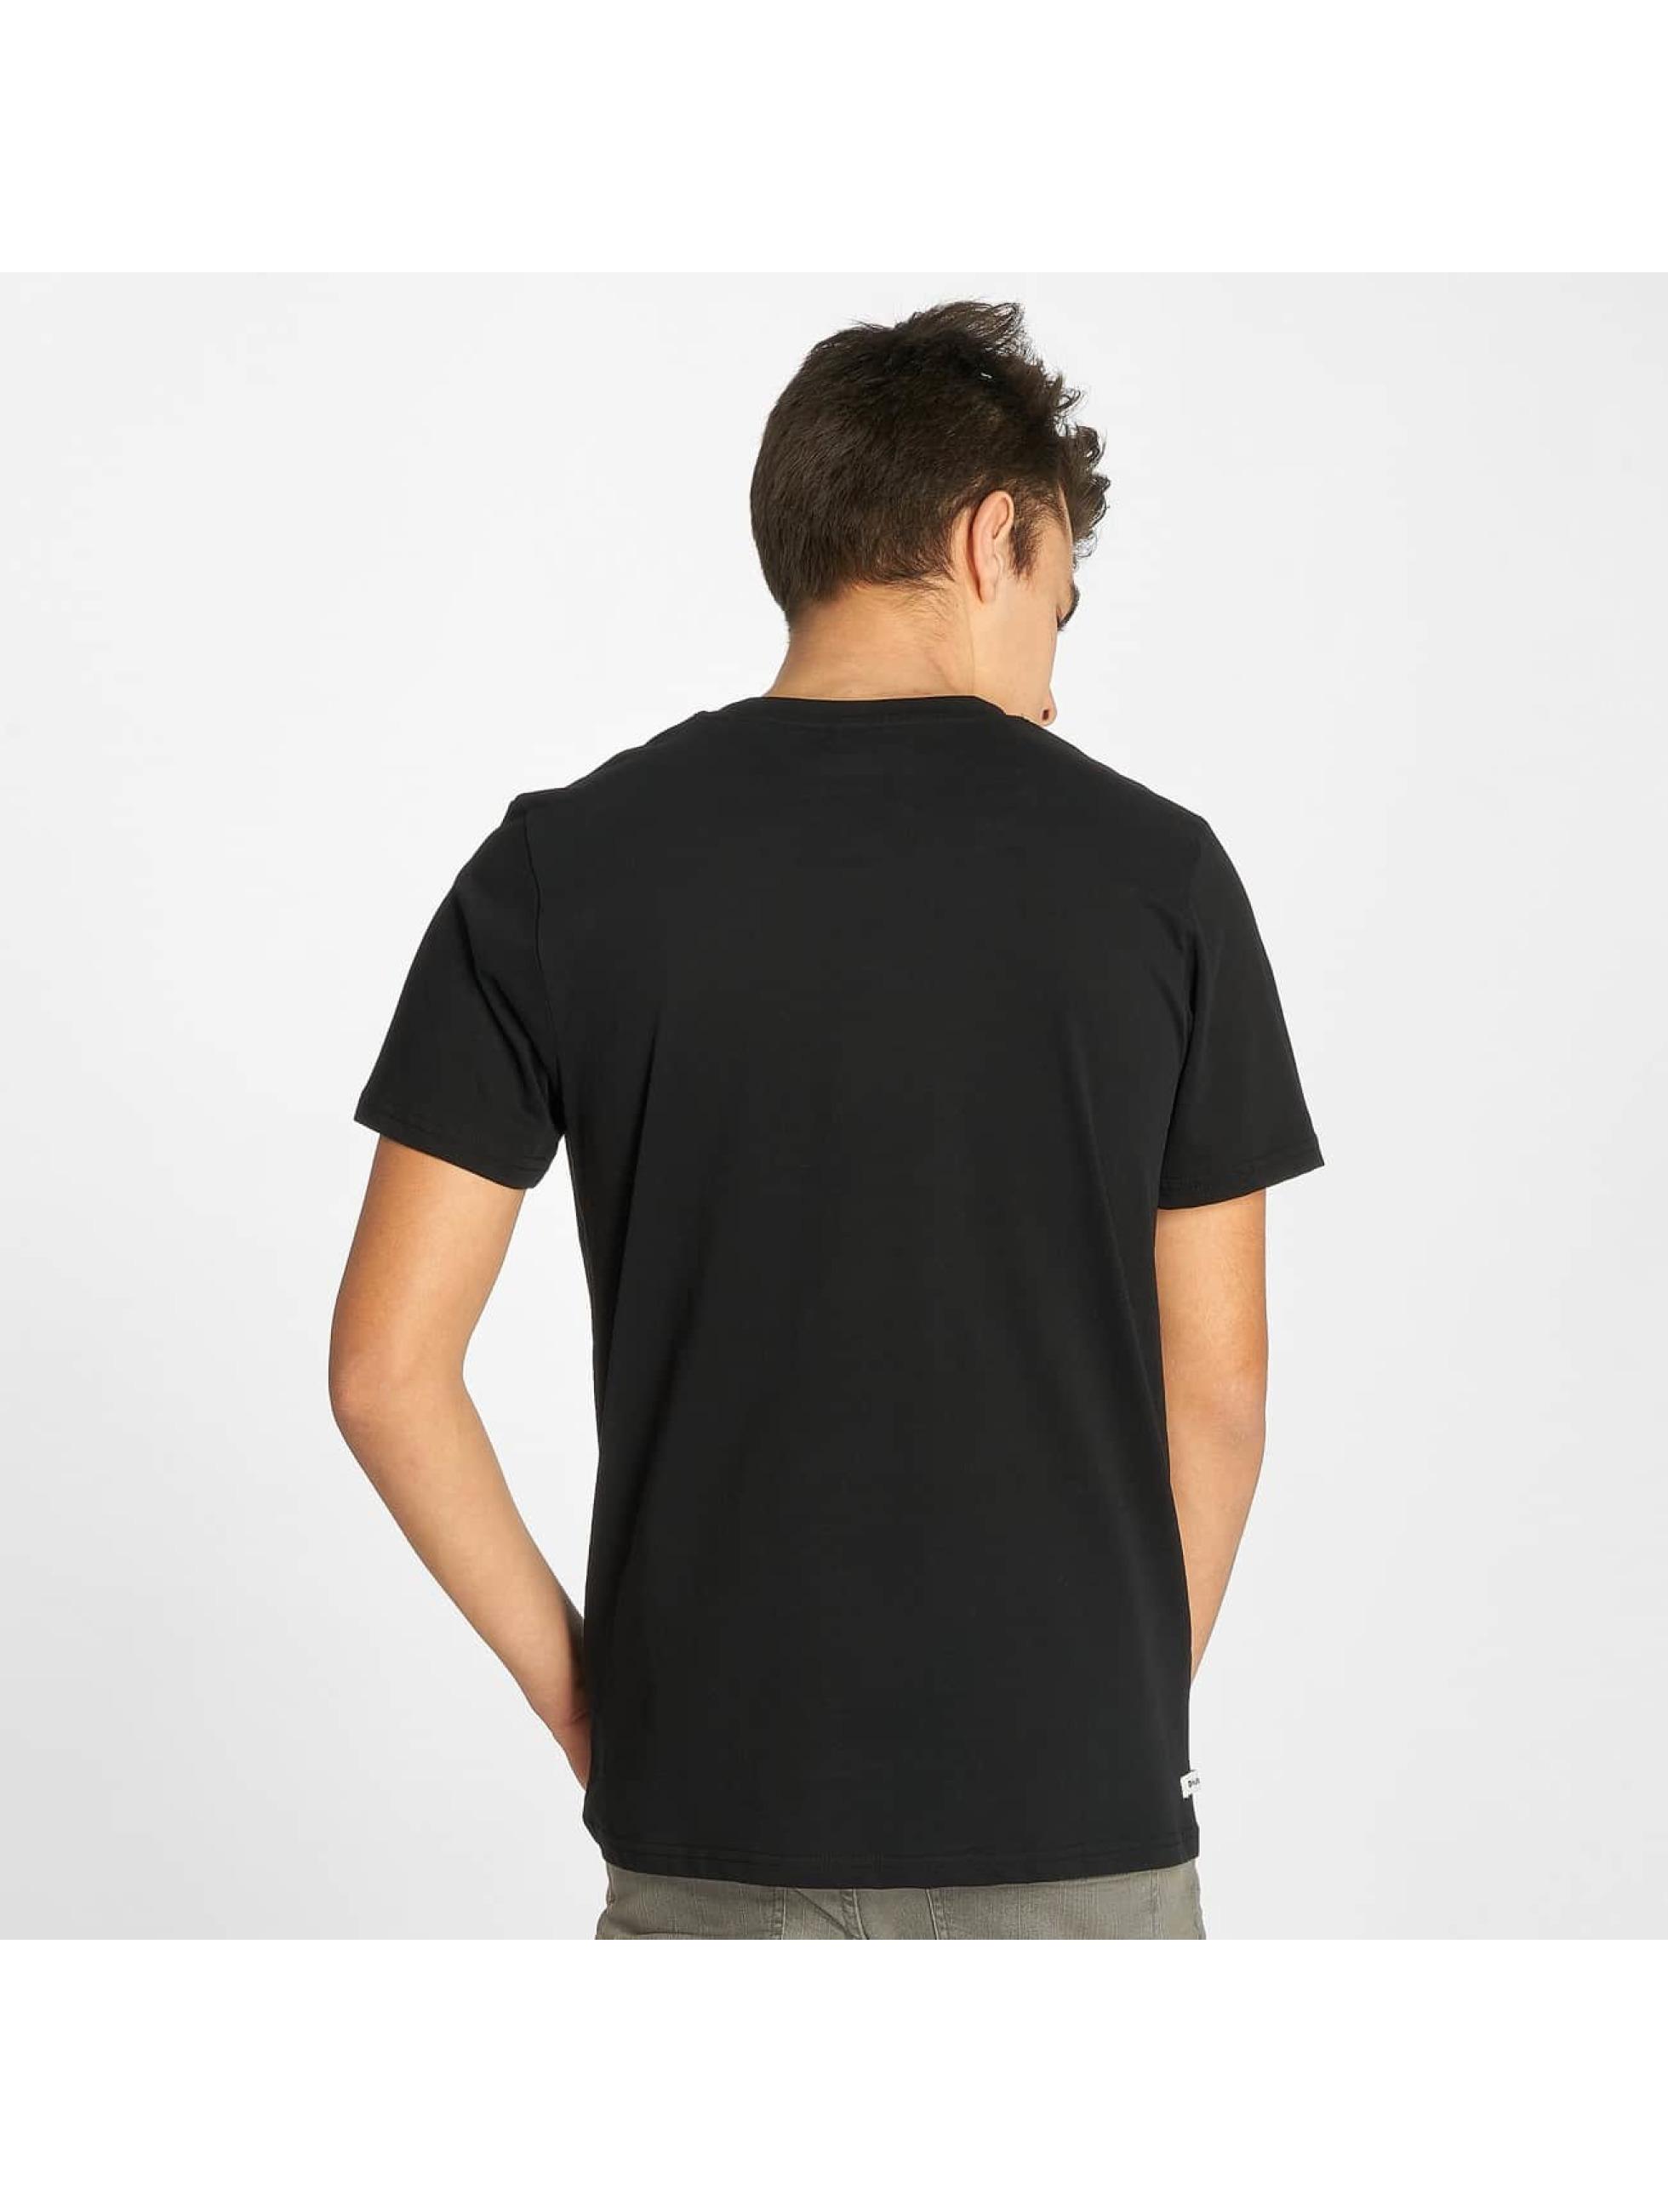 Kulte T-Shirt Discovery schwarz